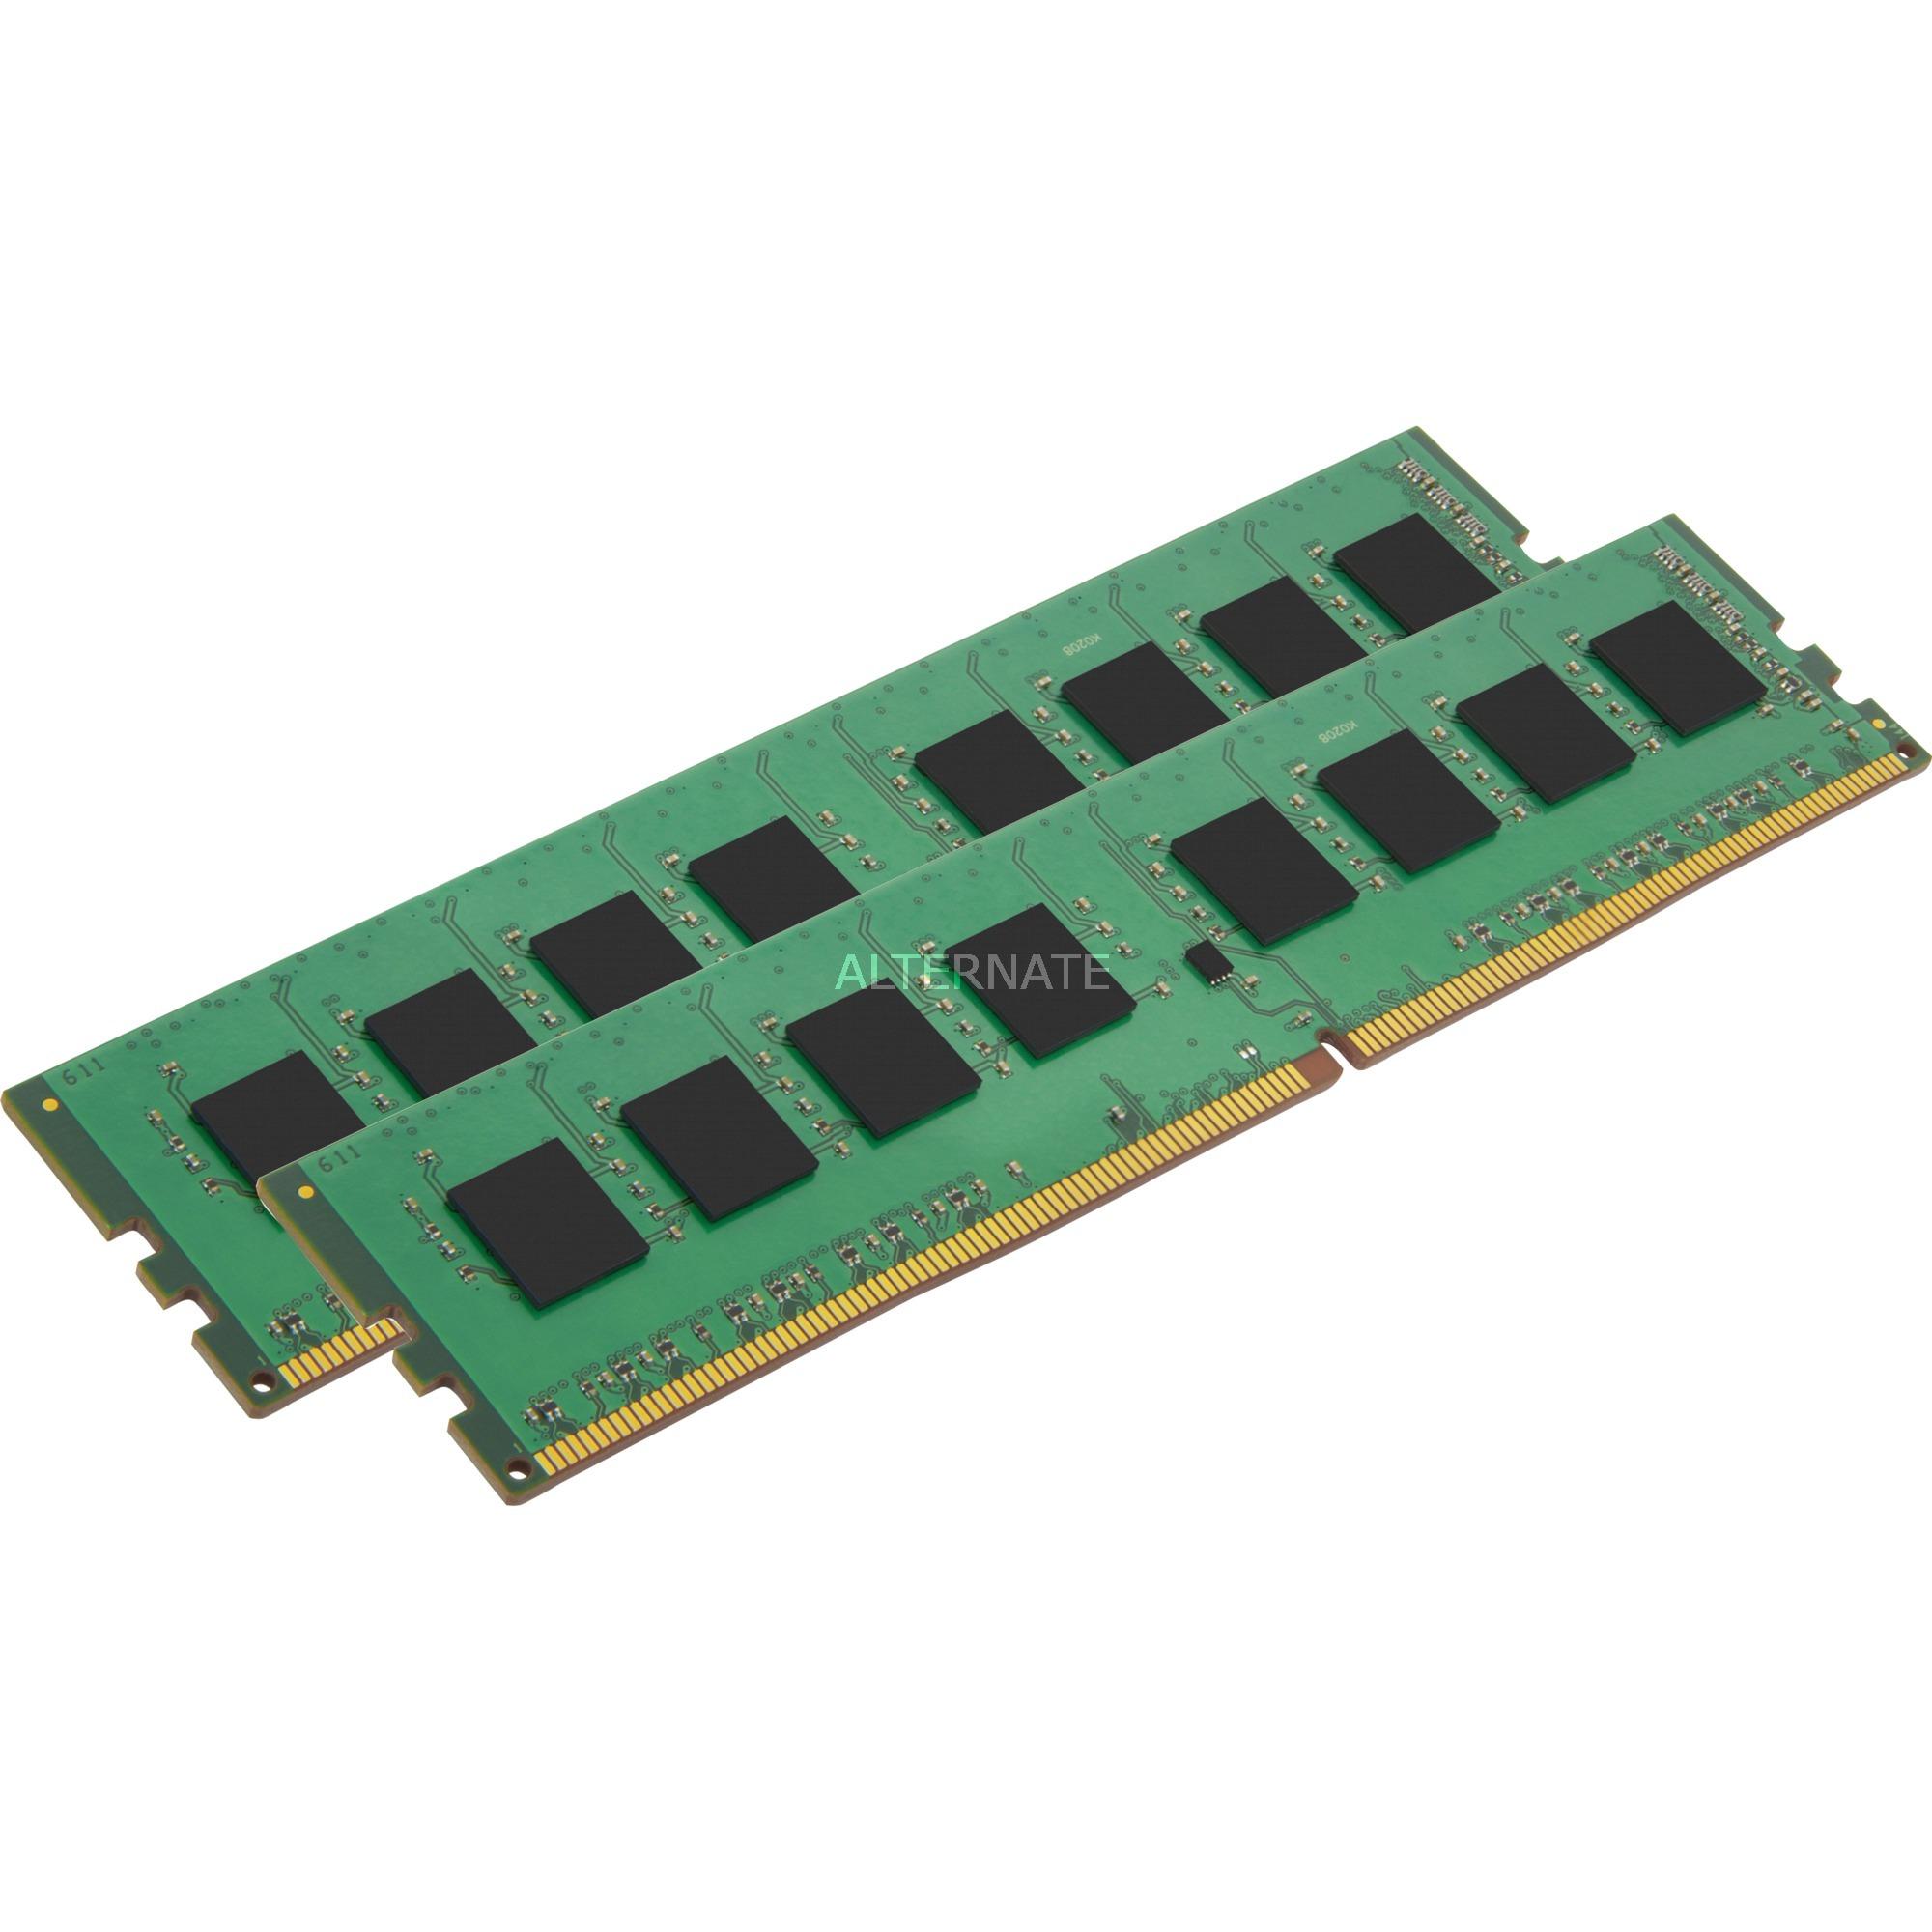 KVR24N17S6K2/8, Memoria RAM